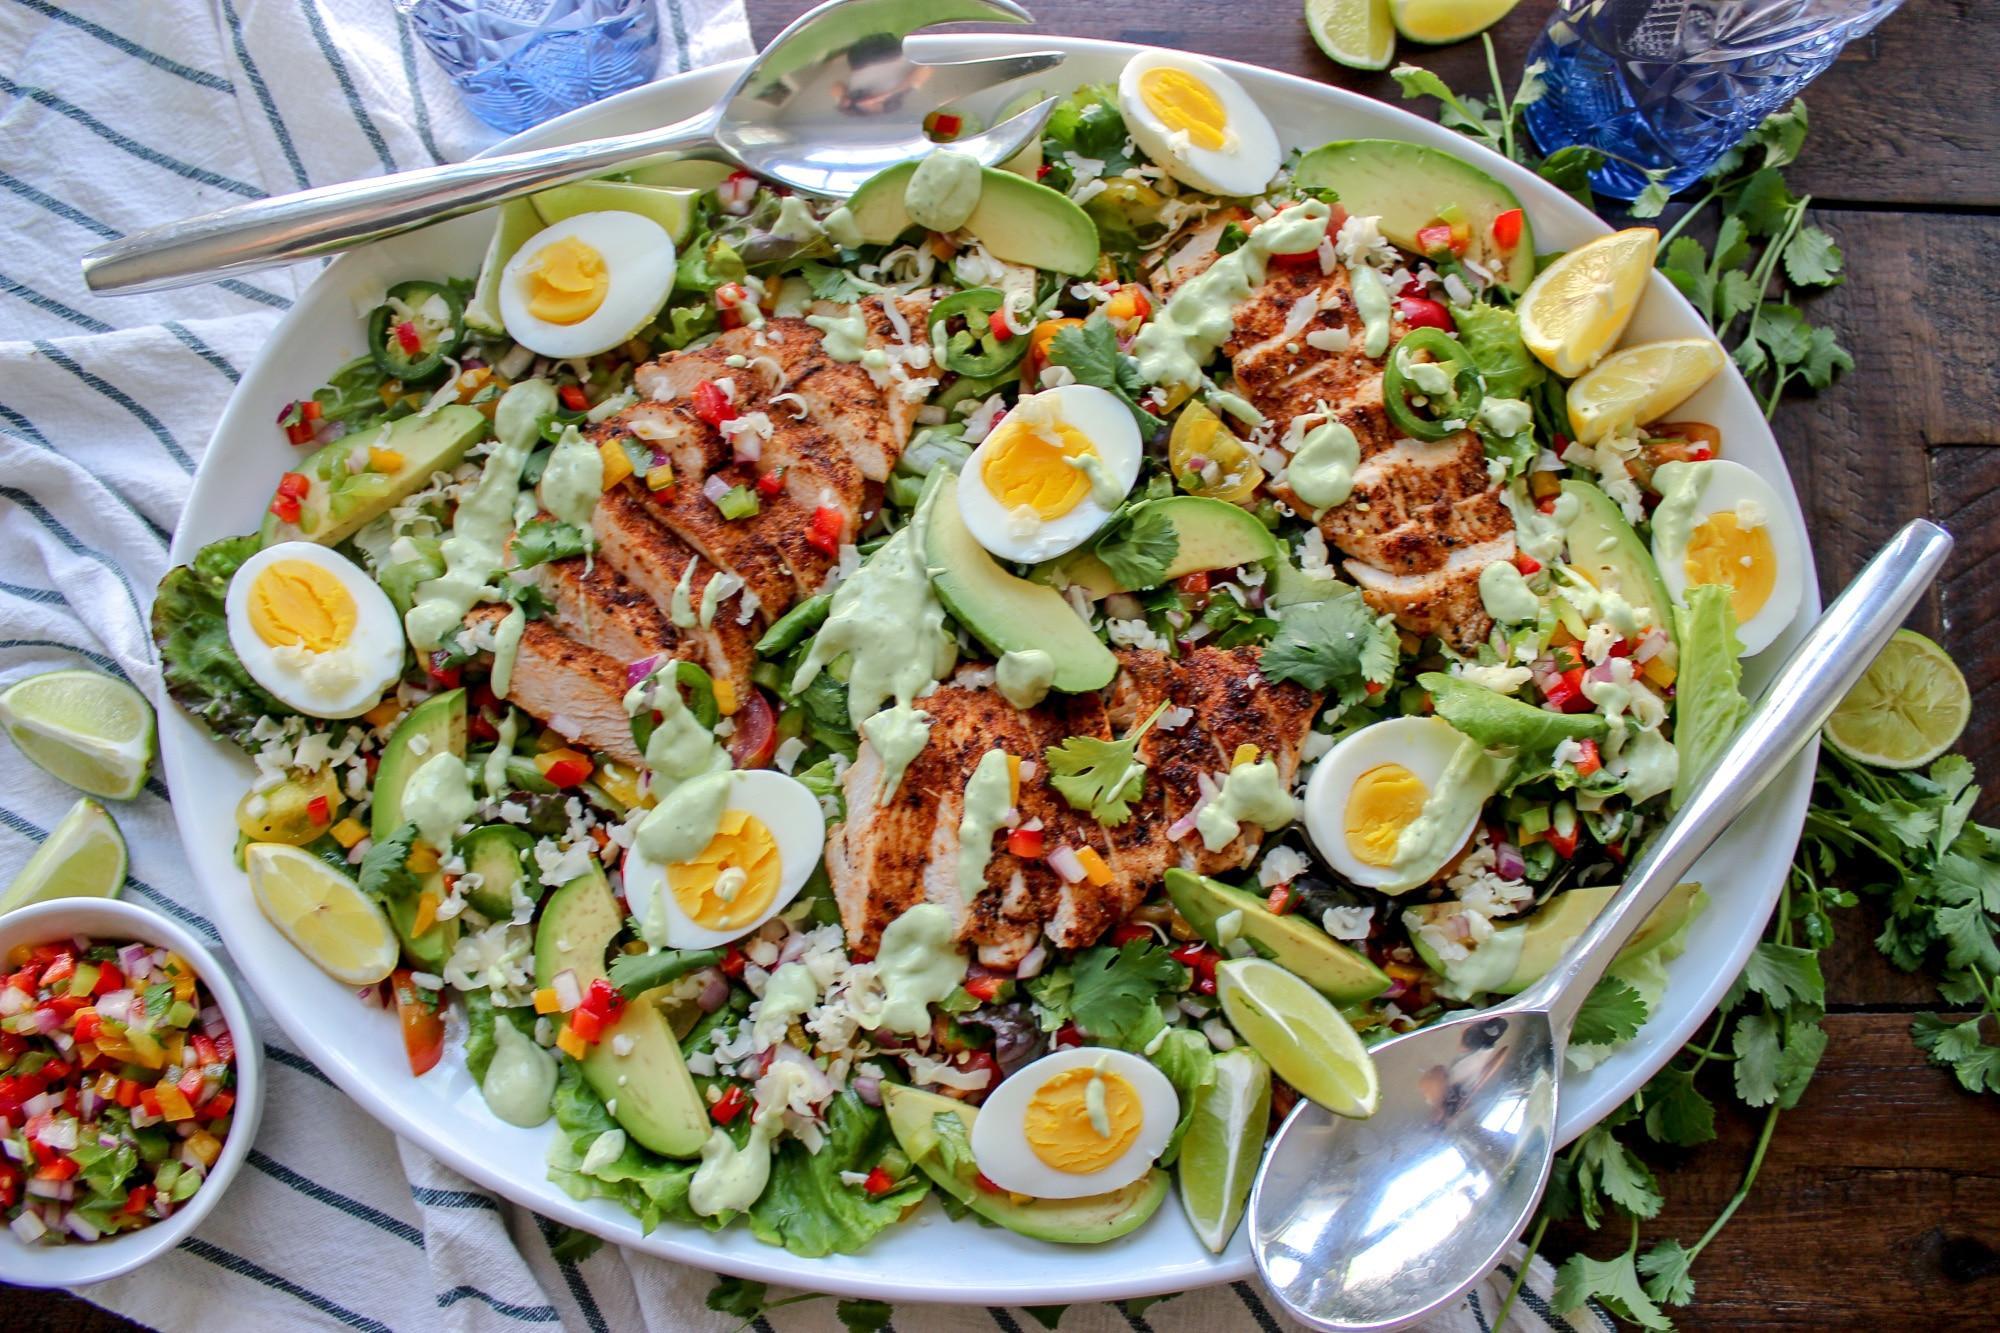 Southwestern Fiesta Salad With Avocado Dressing